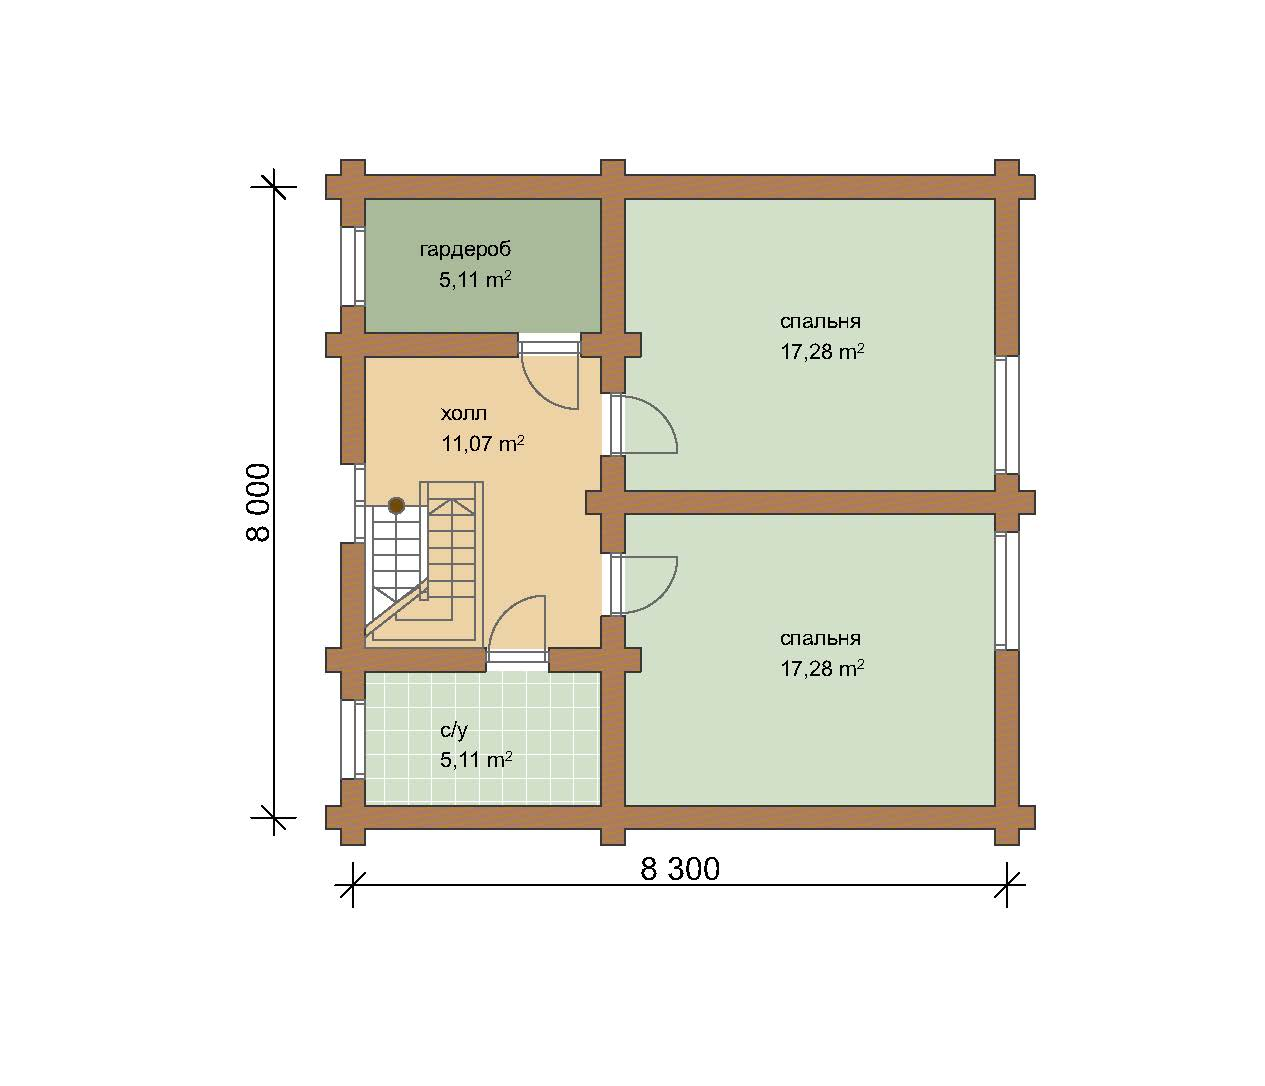 Дом 155.95 м2 10.5х15.3 по проекту АЗАТСКИЙ план